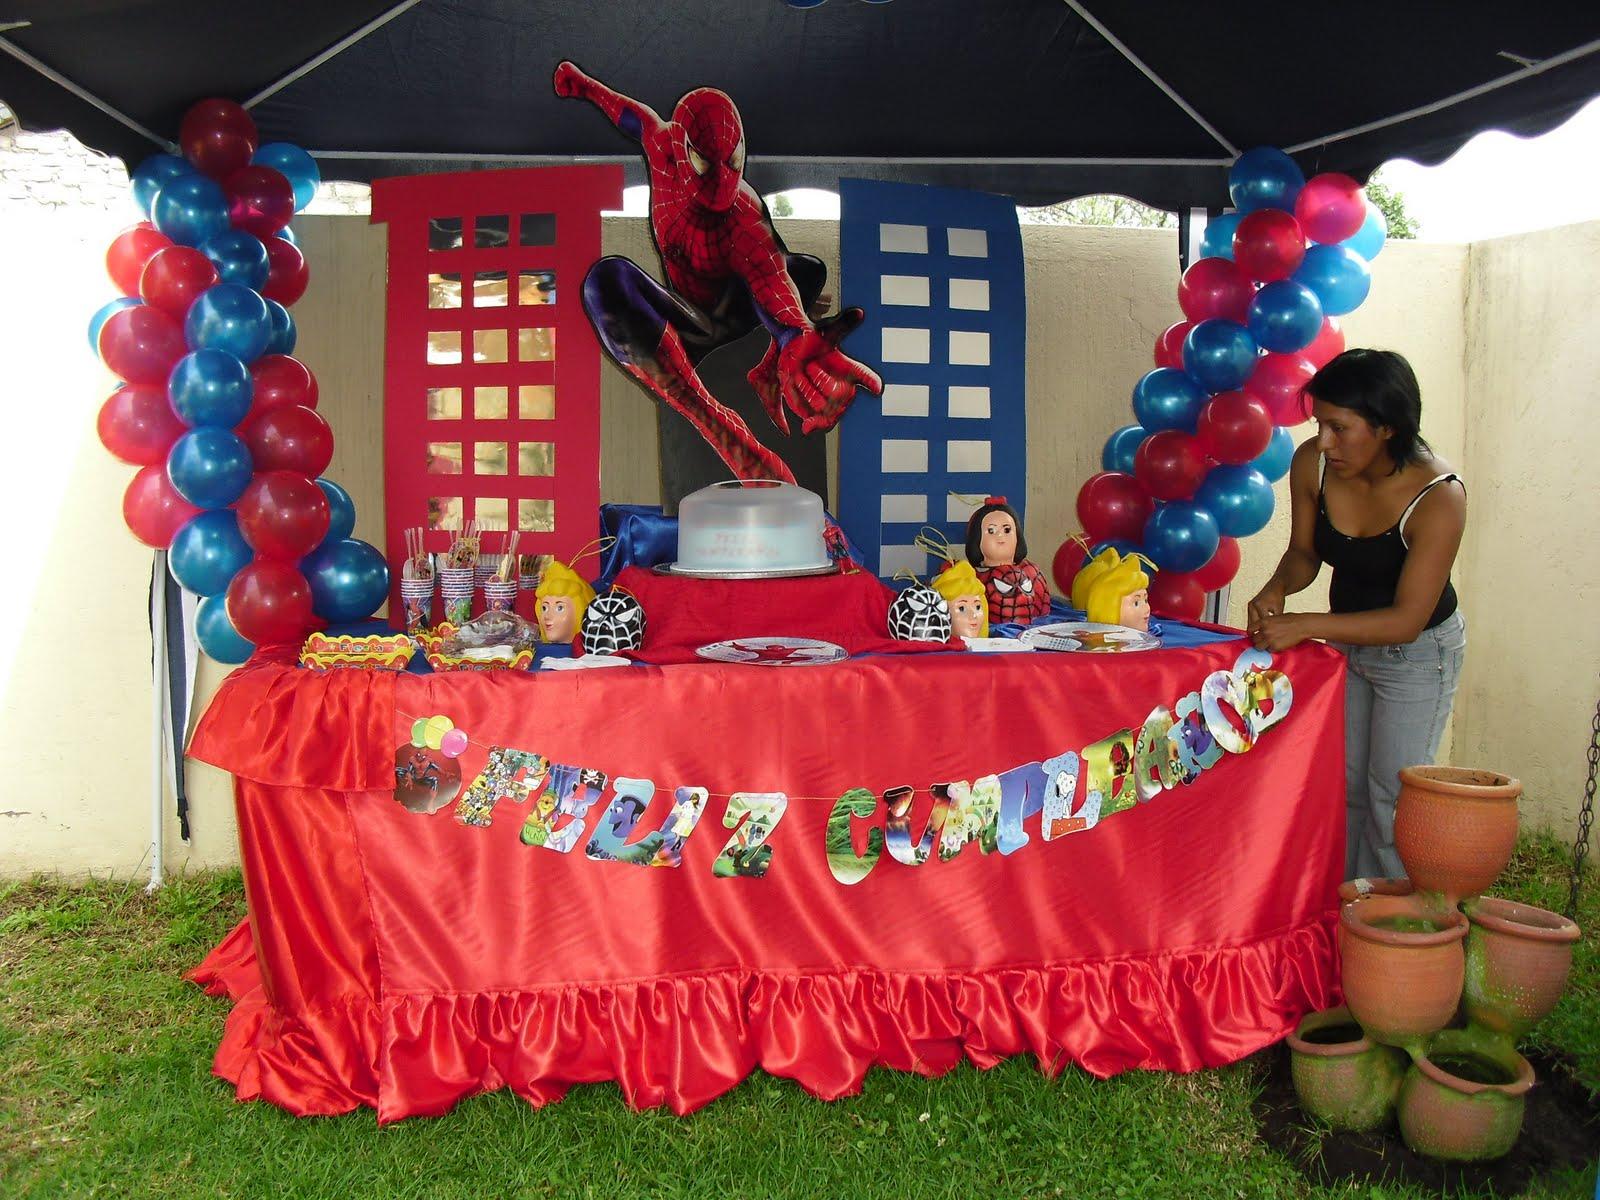 Decoracion de spiderman para fiesta infantil - Decoracion fiesta cumpleanos infantil ...